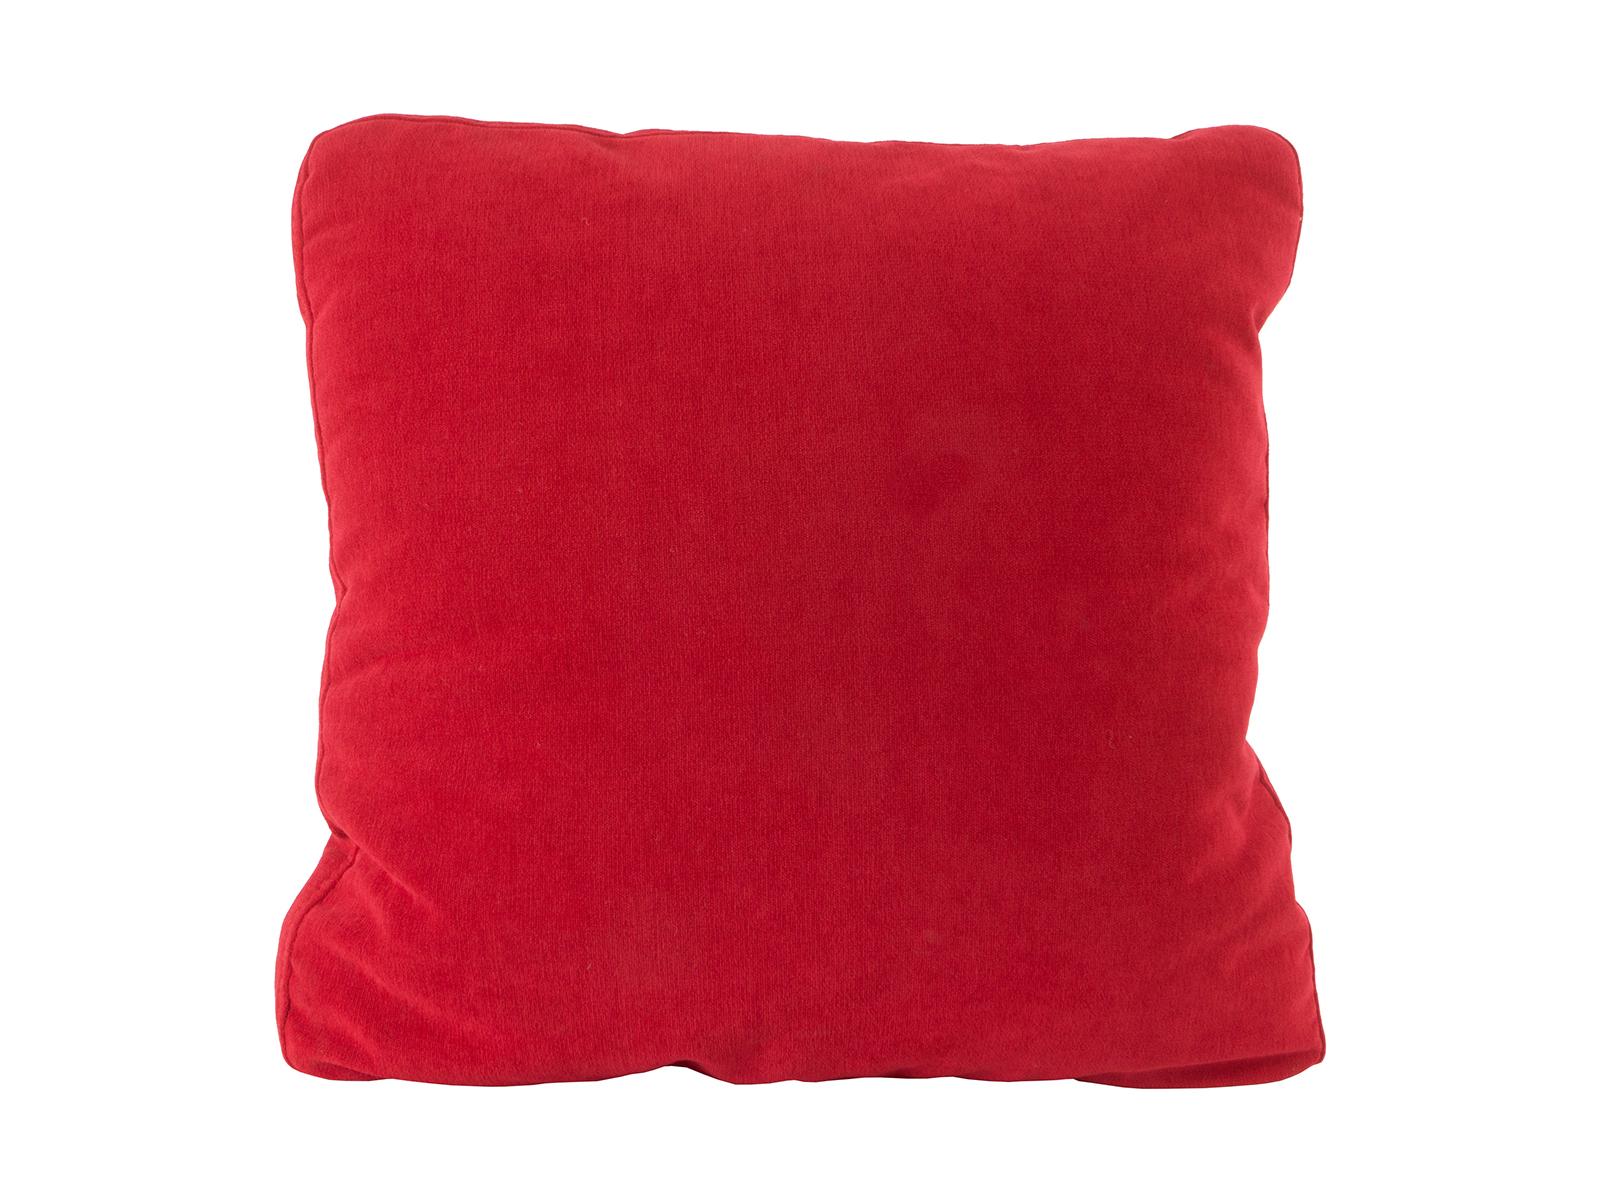 Подушка IgarkaДекоративные подушки<br>Декоративная подушка со съемным чехлом<br>